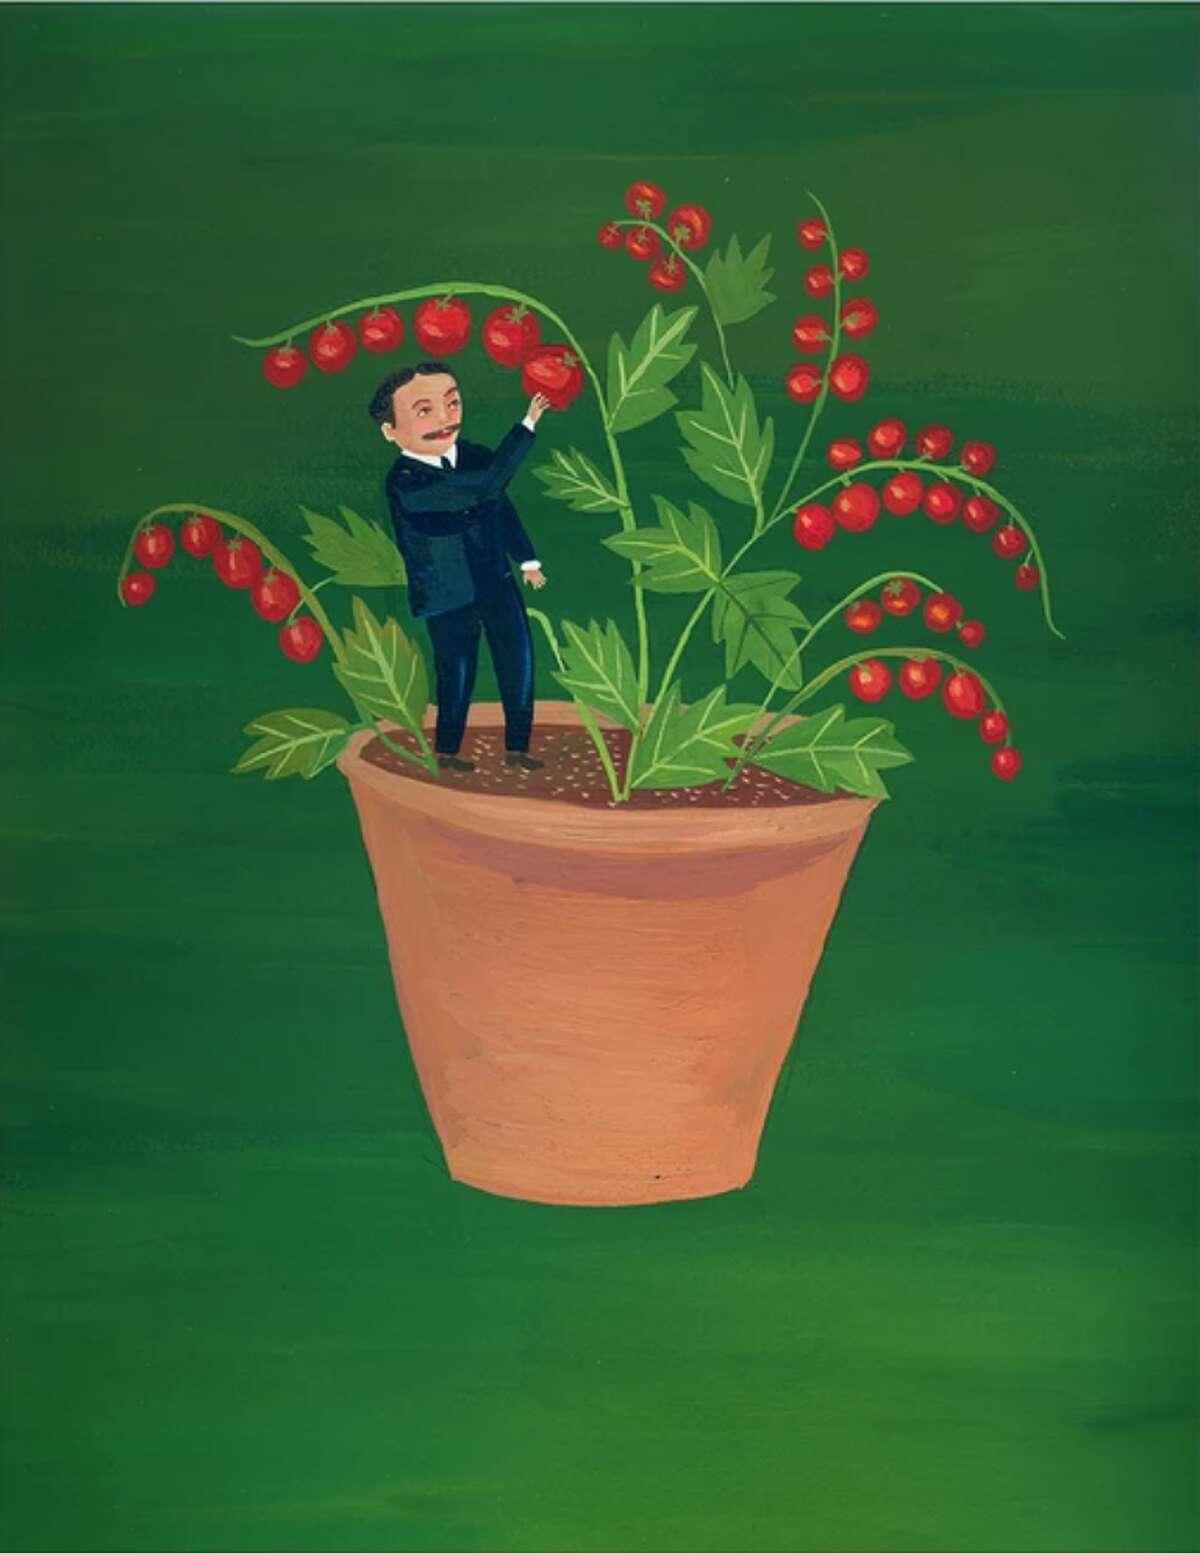 Children's book illustrator Giselle Potter designed this Art Pack for Tiny Tim Tomatoes in 2011.